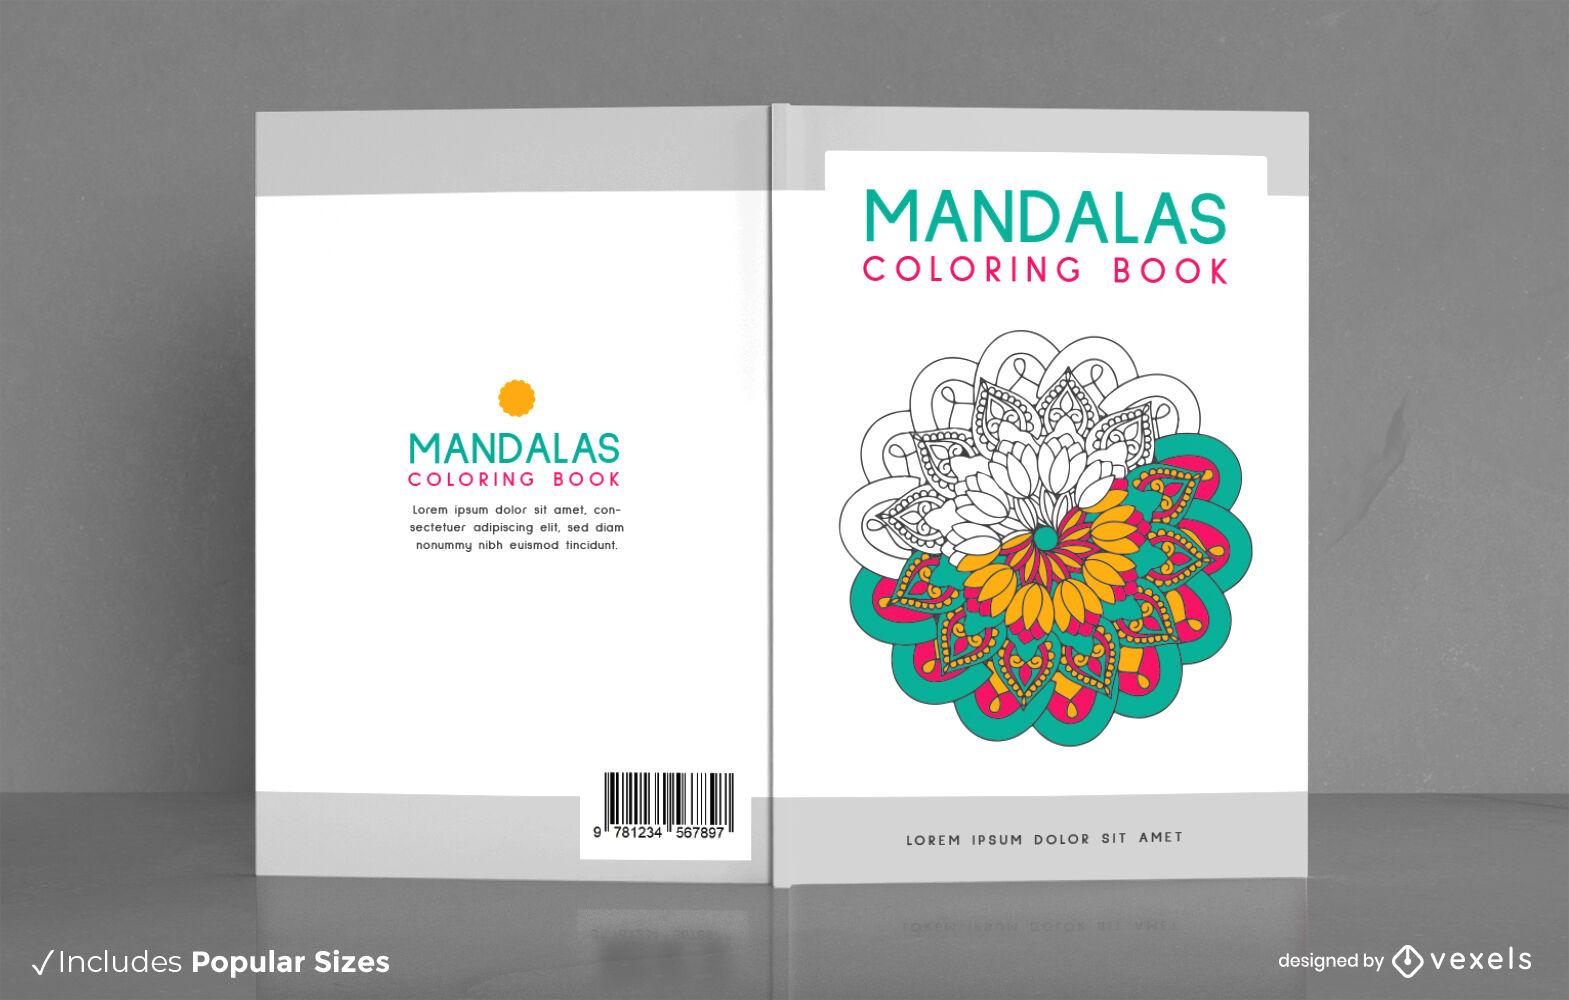 Blumen Mandalas Malbuch Cover Design